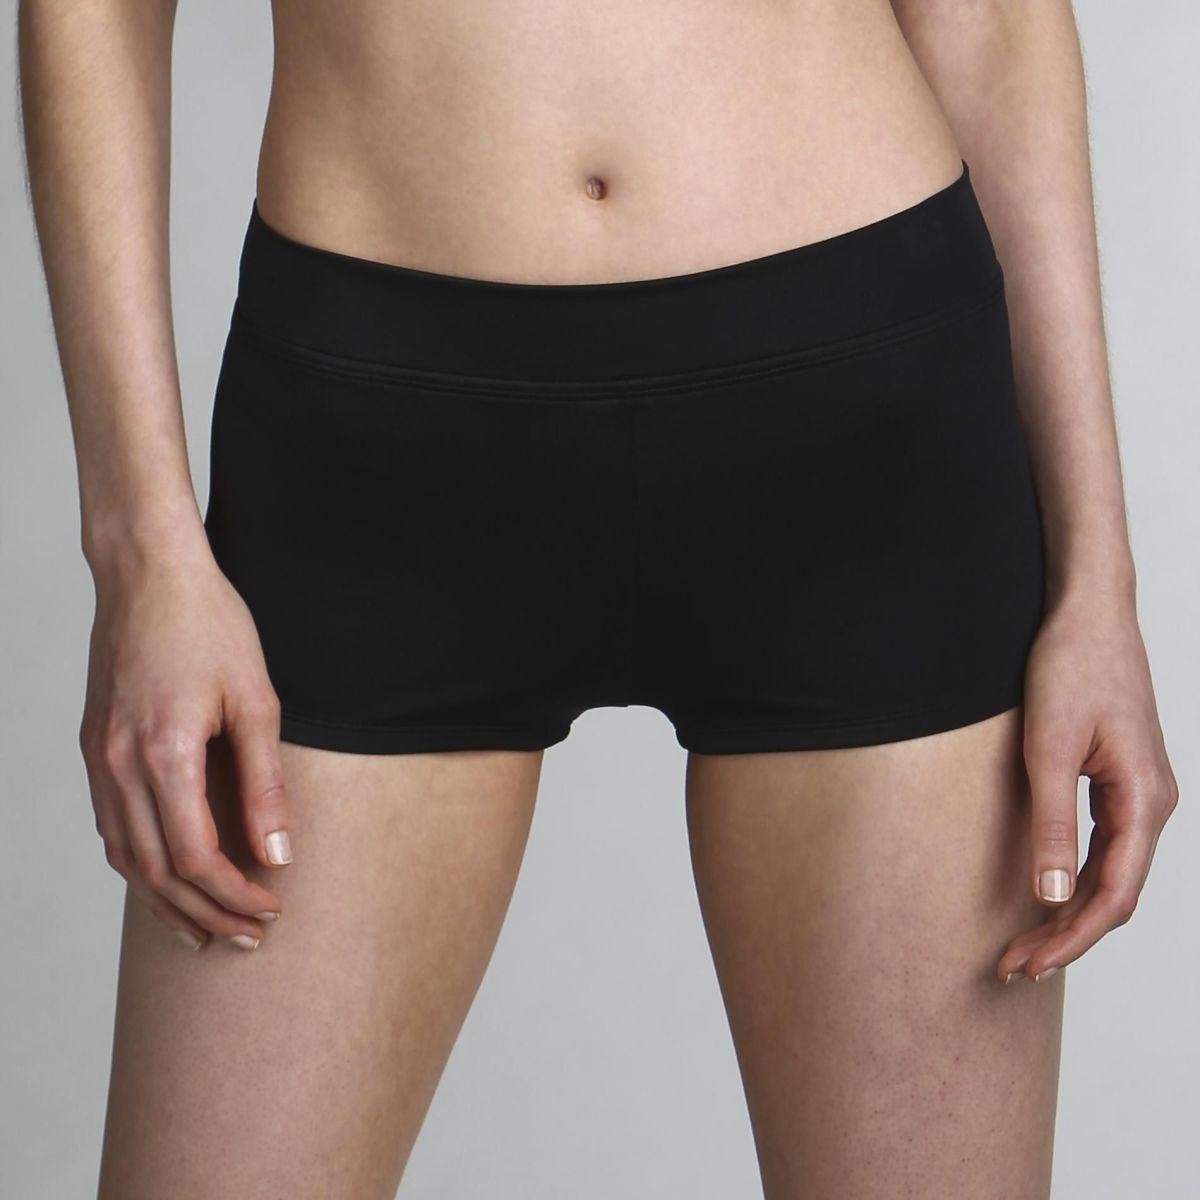 Classic Swim Short - Basic Black Swim Shorts for Women - Tropical Escape  Women's Swim Shorts